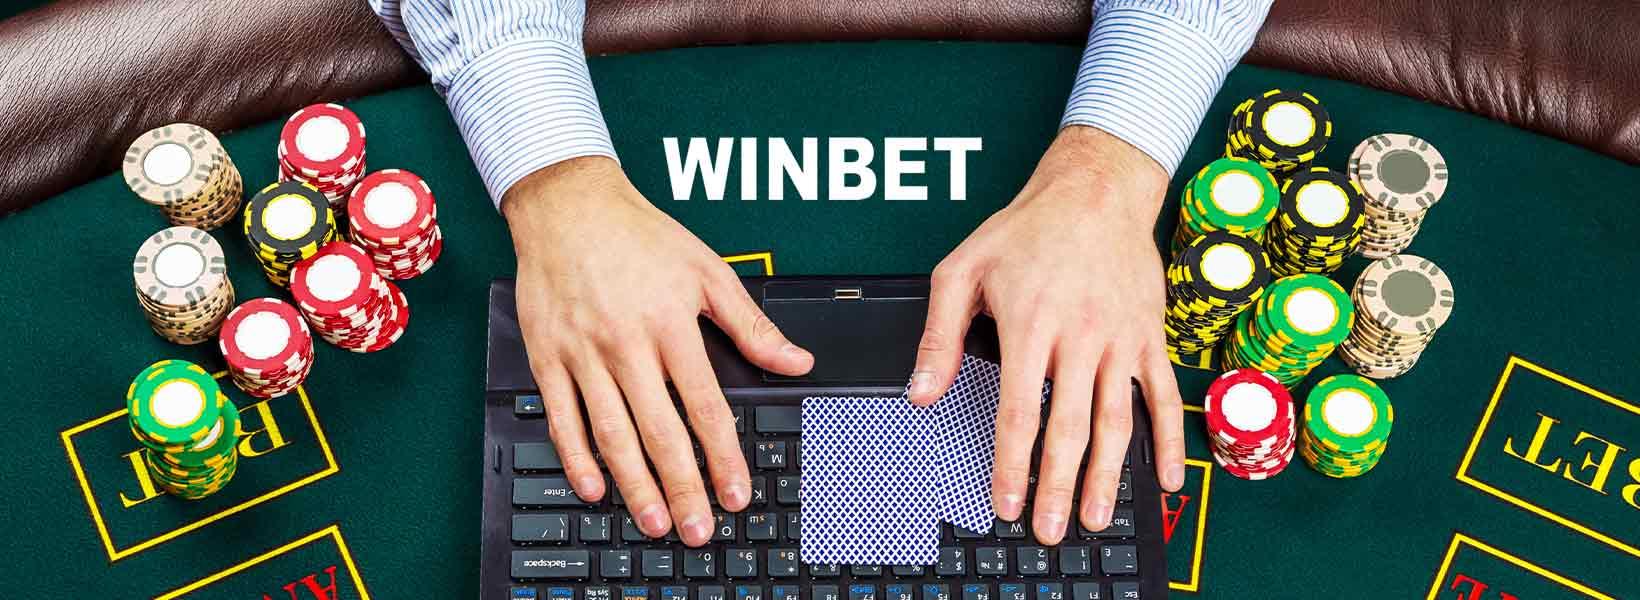 winbet blackjack